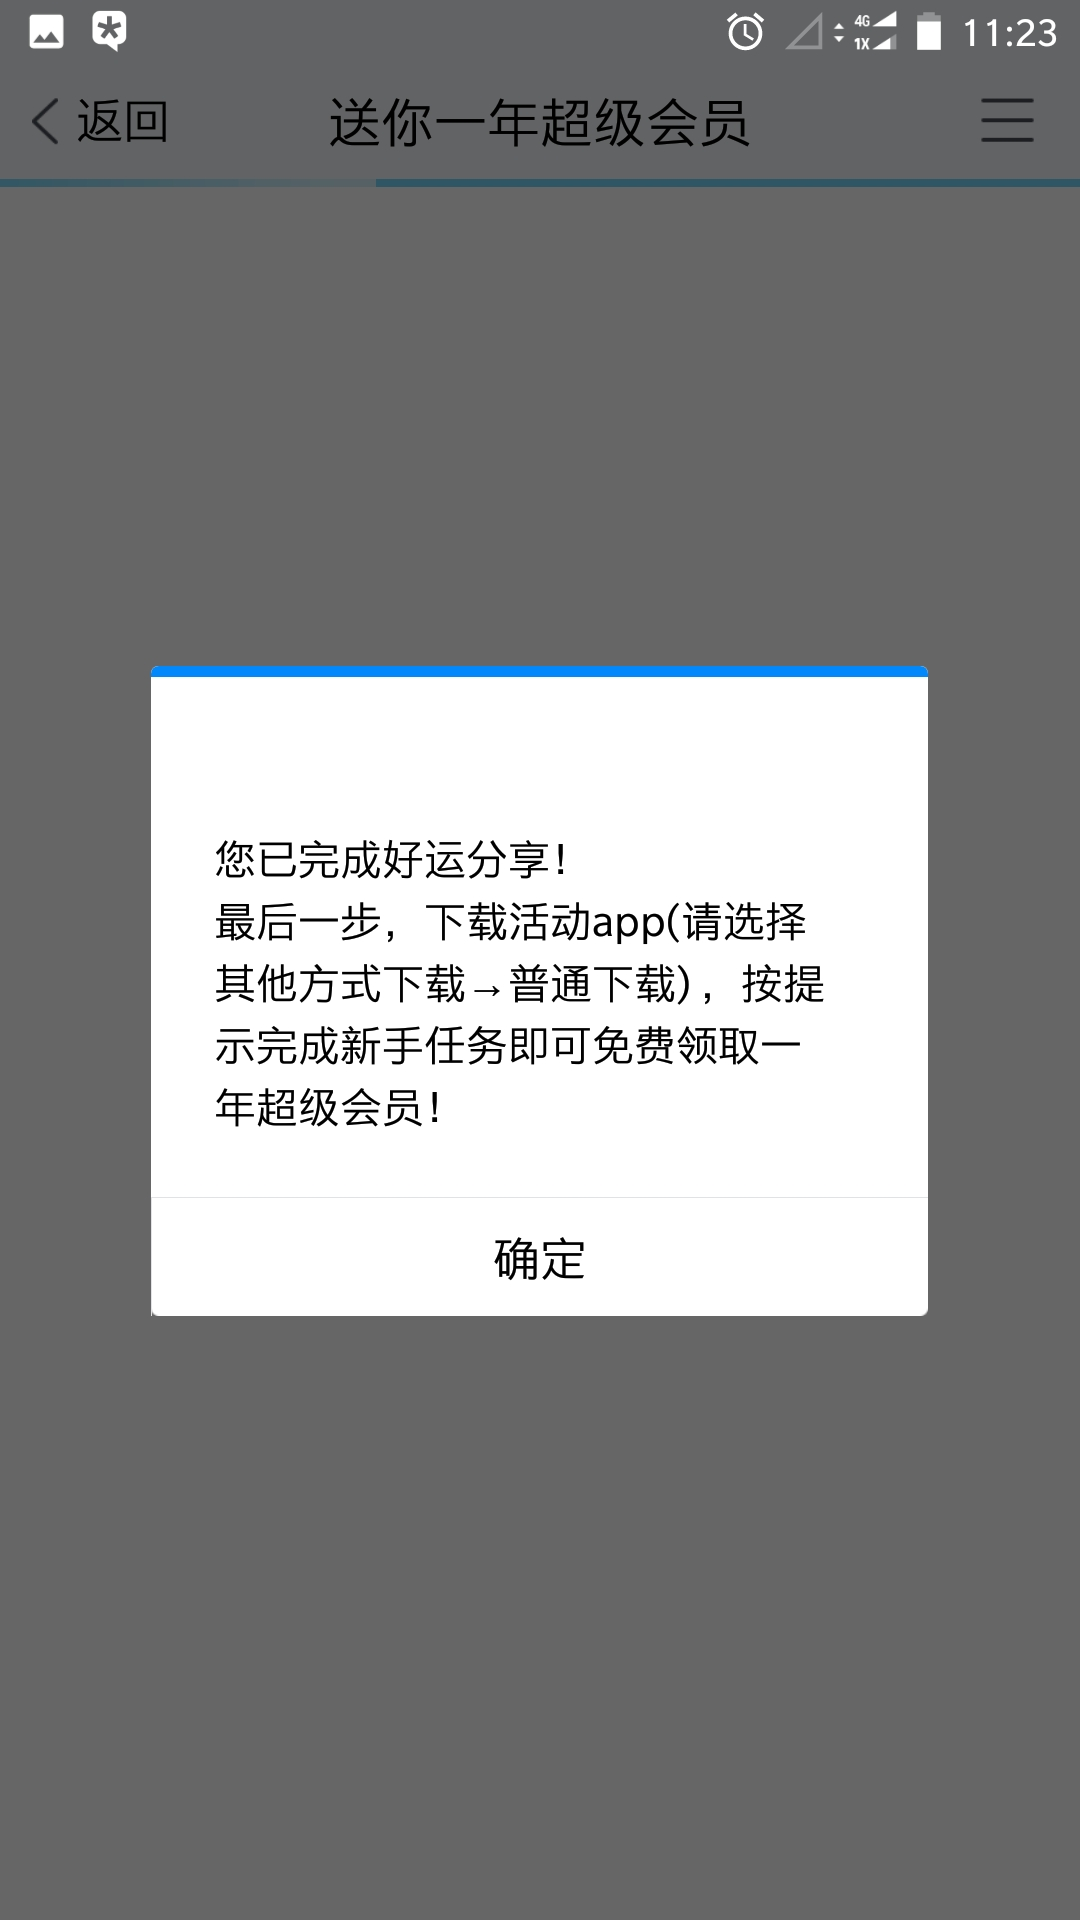 QQ送你一年超级会员系假的、是米赚做的推广